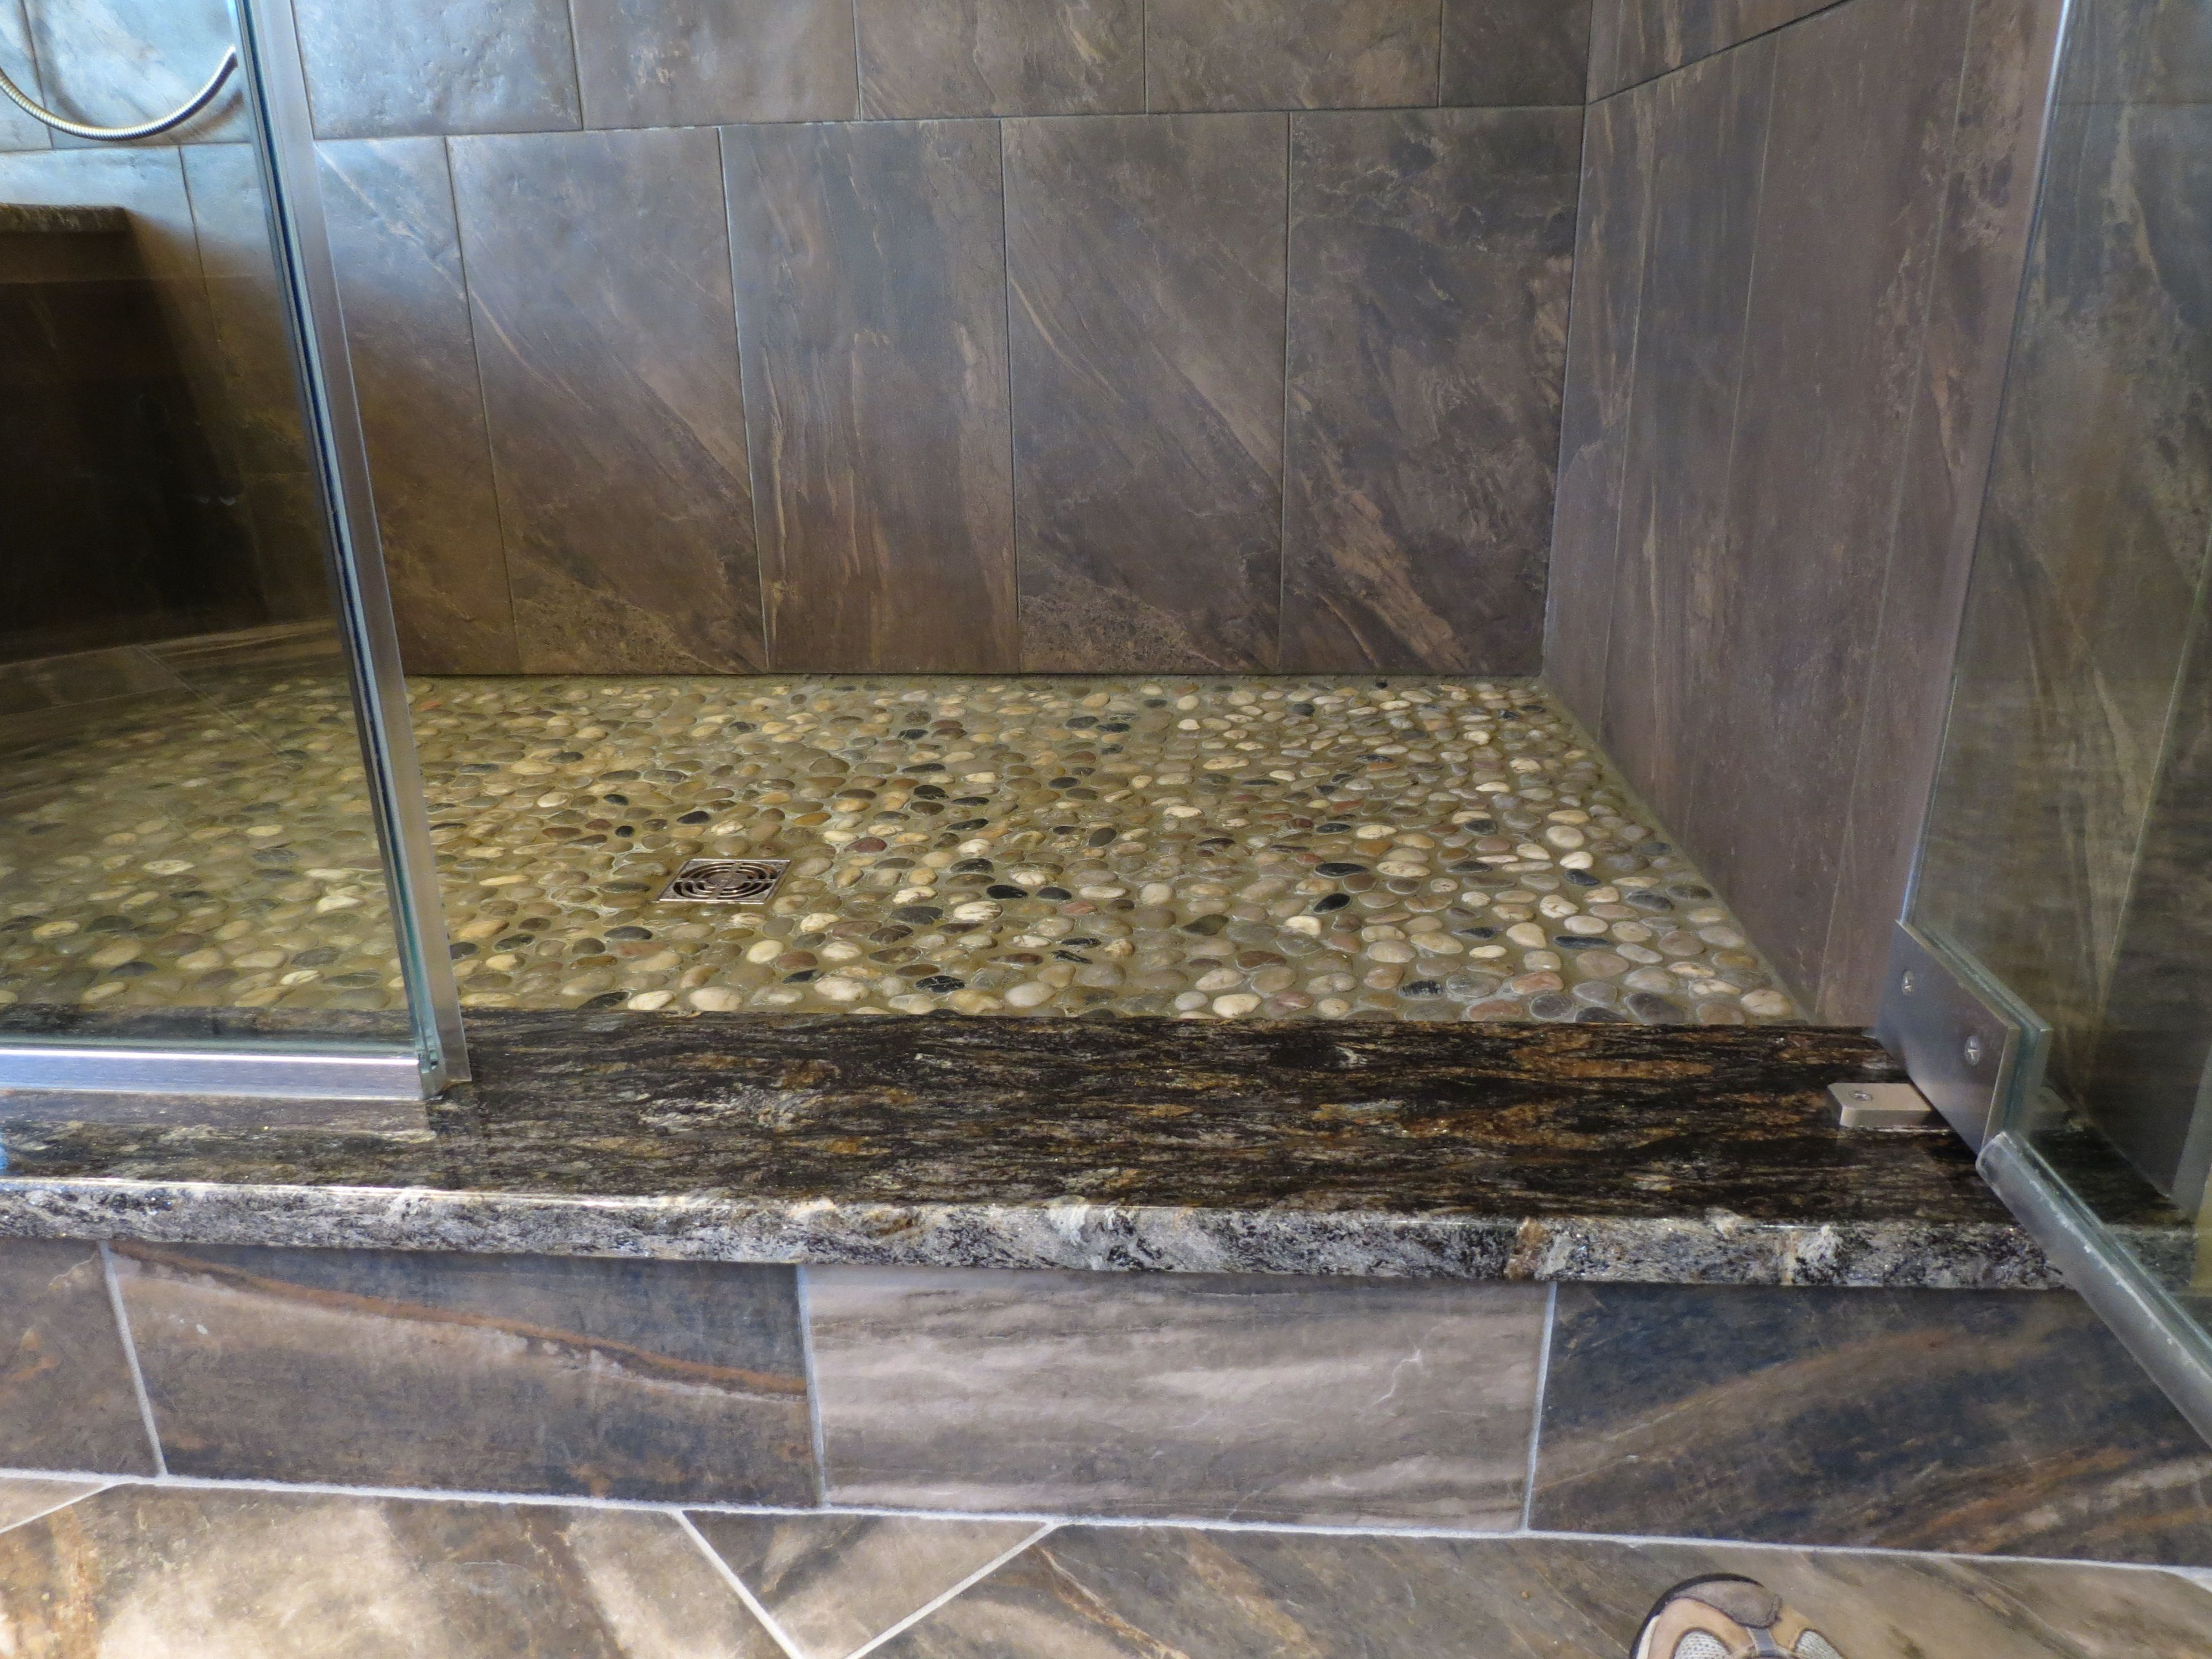 Granite Bathroom Tile Tile Baseboard Comes Up To The Granite Shower Threshold The